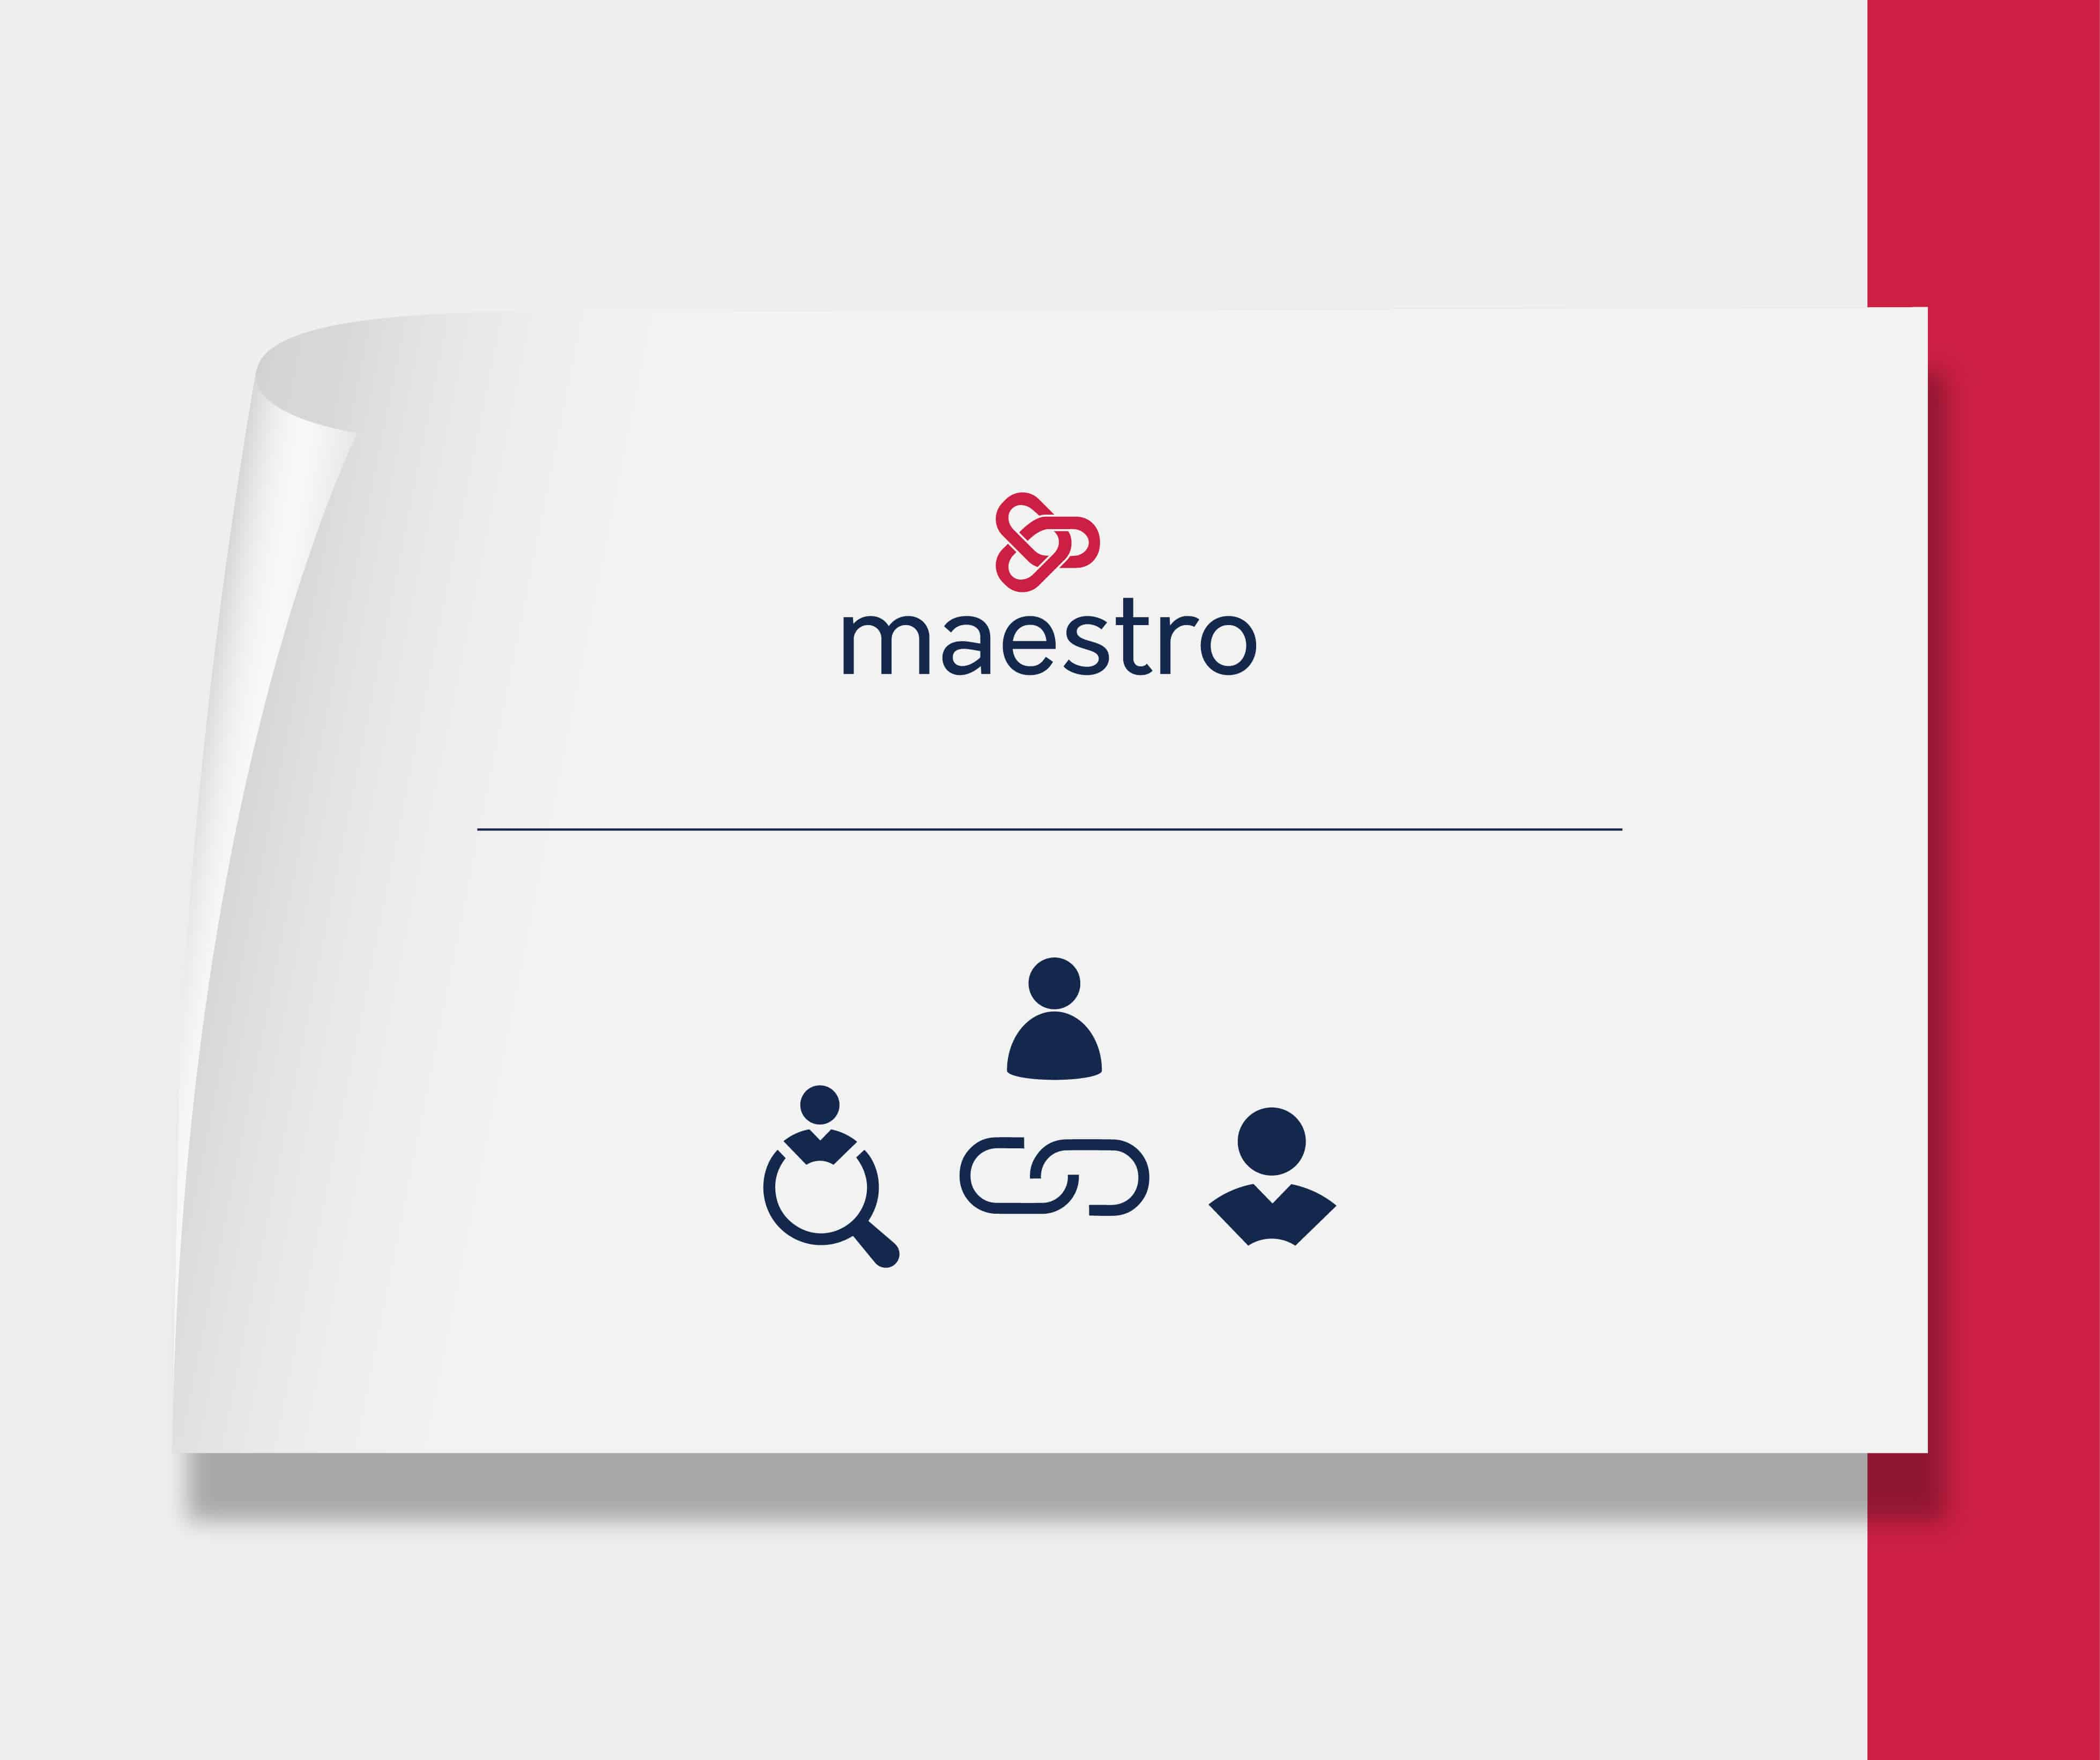 https://horizonplus.eu/project/maestro/